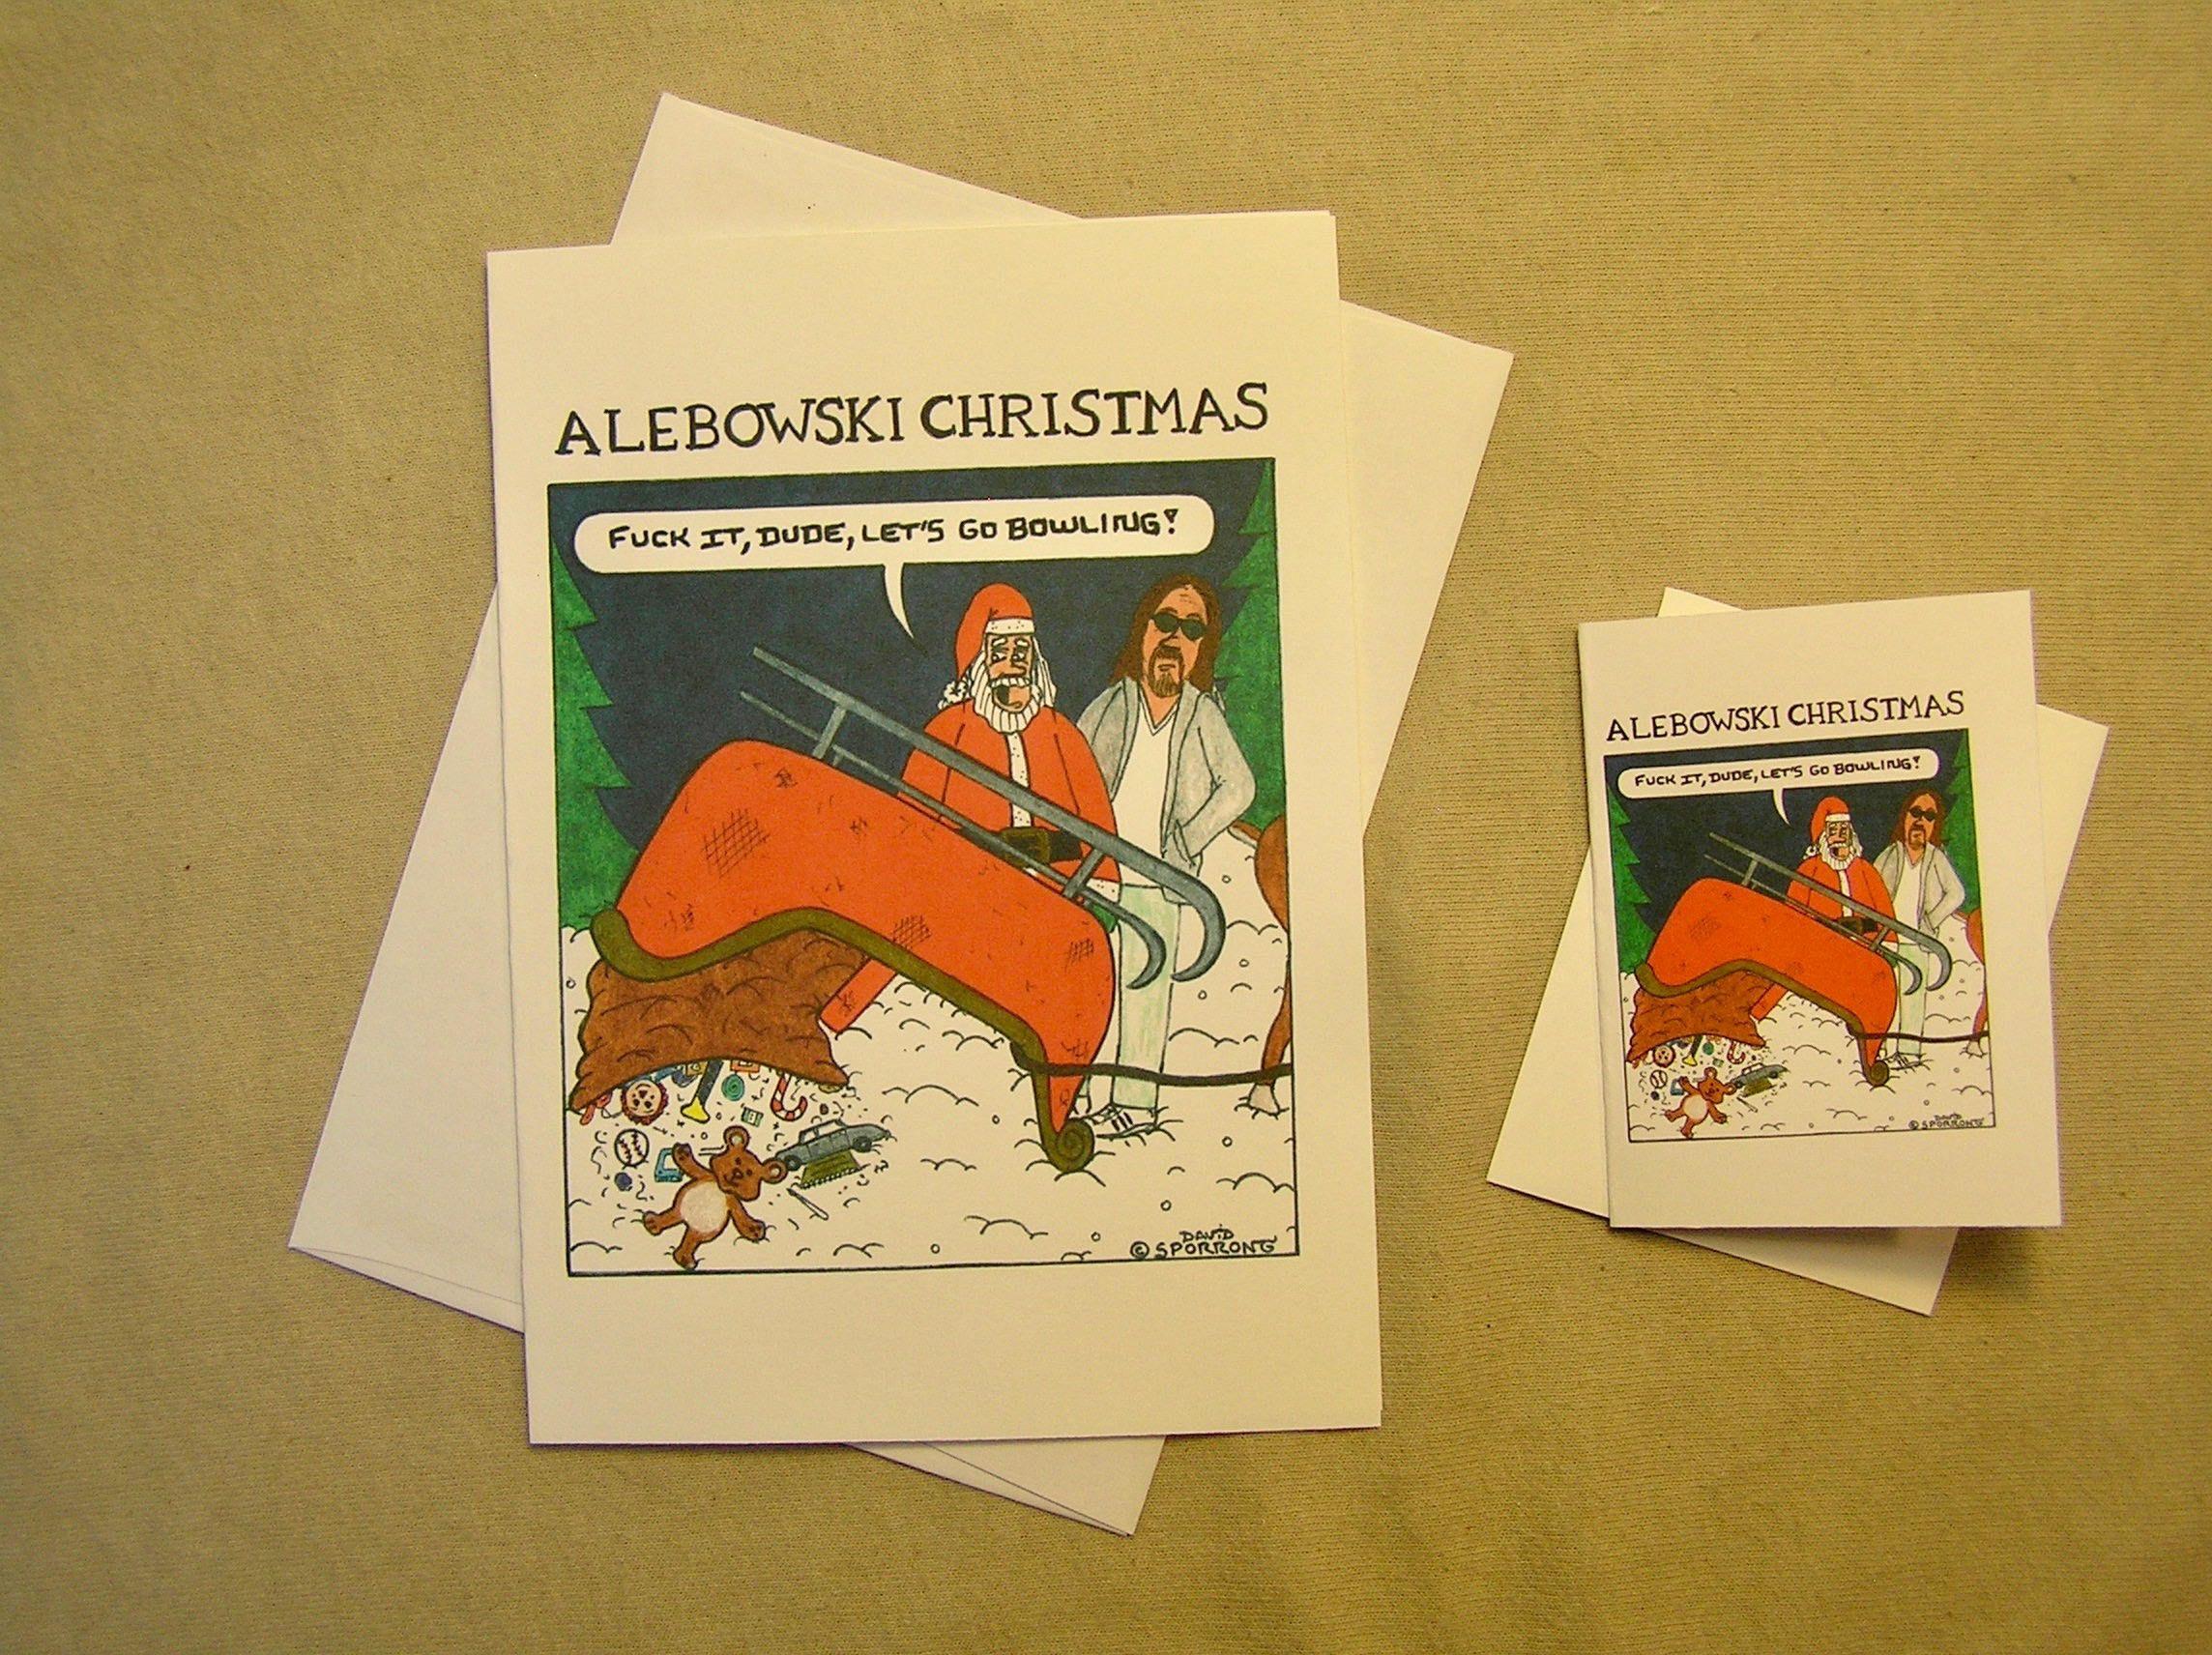 A Lebowski Christmas Card Santas Wrecked Sleigh Regular Size And